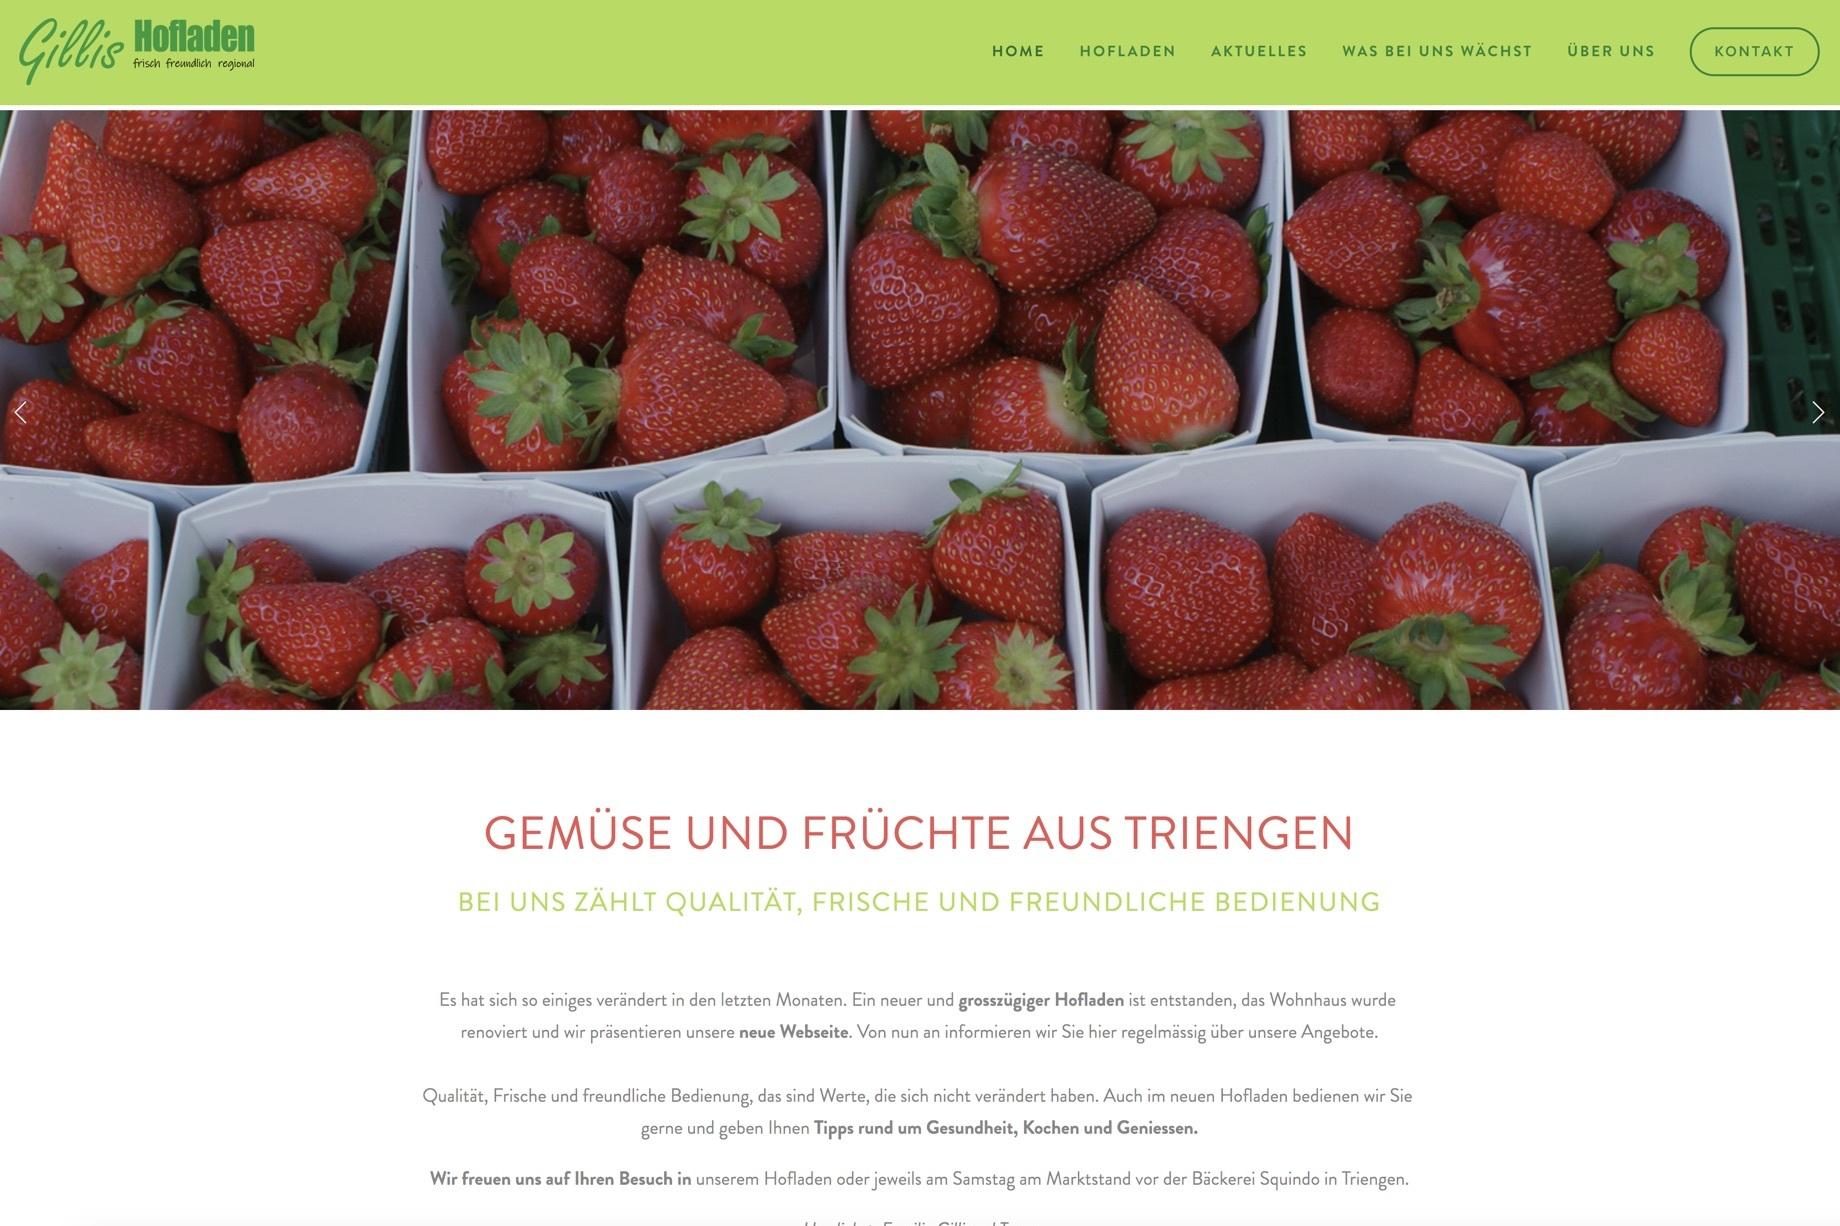 www.gillis-hofladen.ch - Webdesign